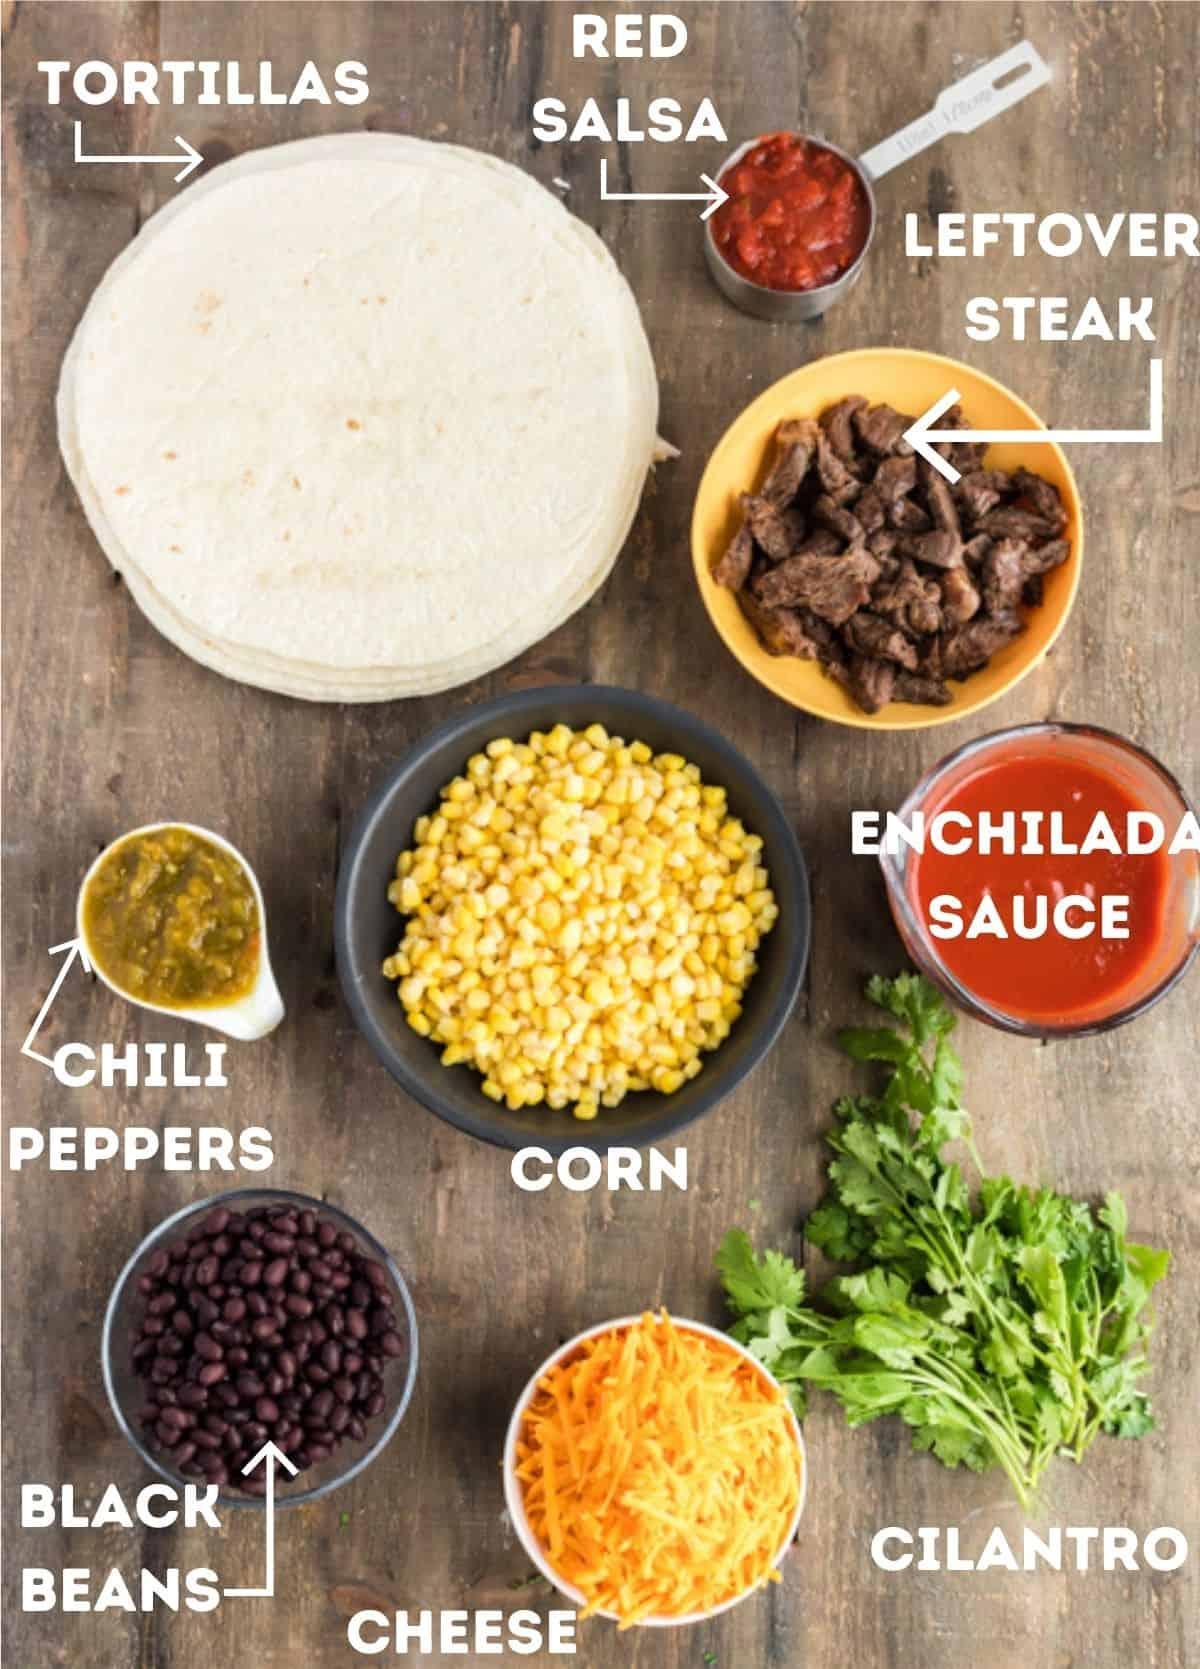 Leftover steak and other ingredients to make beef enchiladas.